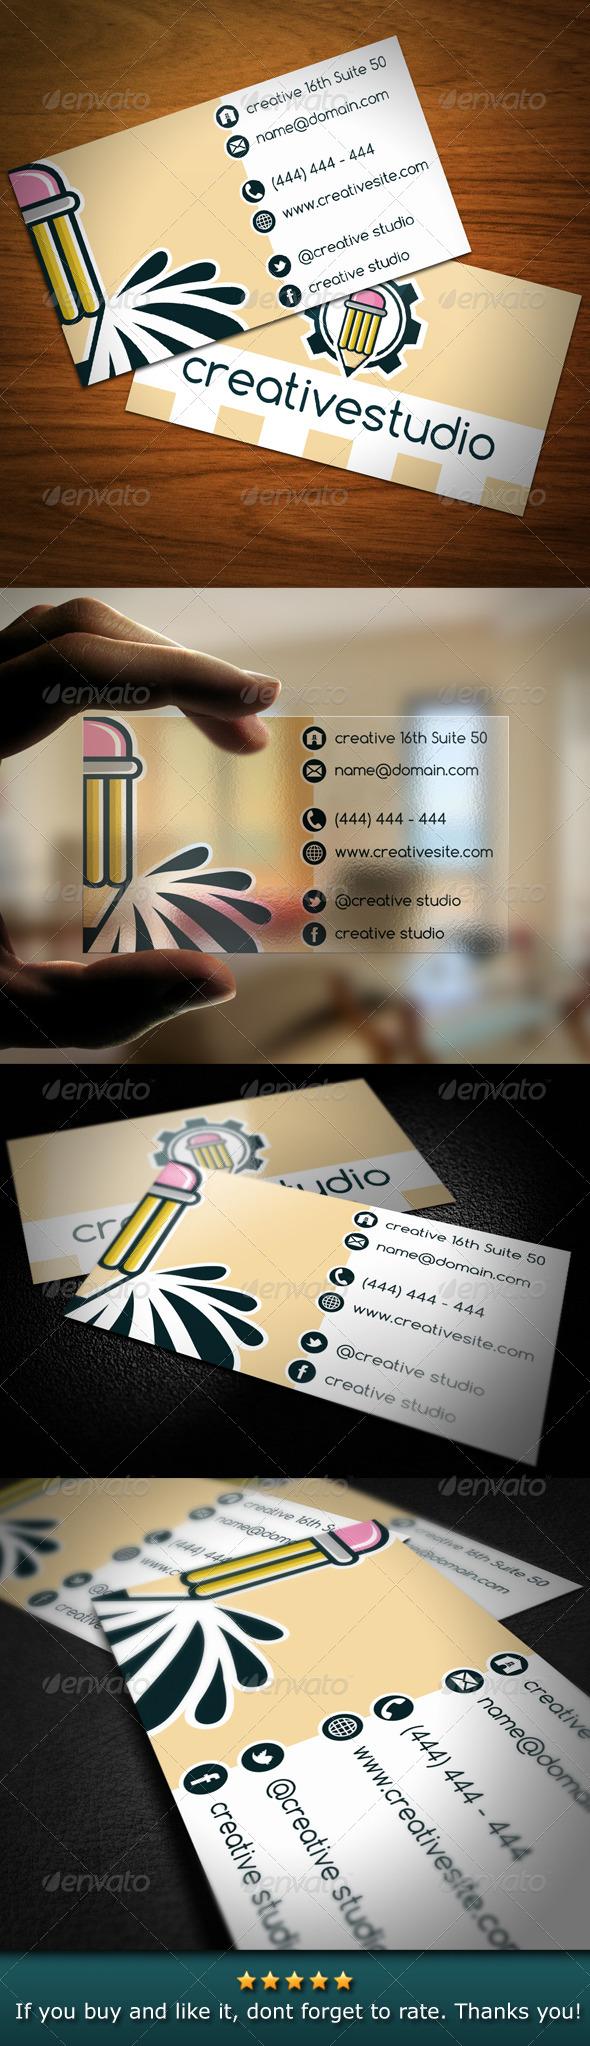 Creative Studio Pencil Business Card - Creative Business Cards